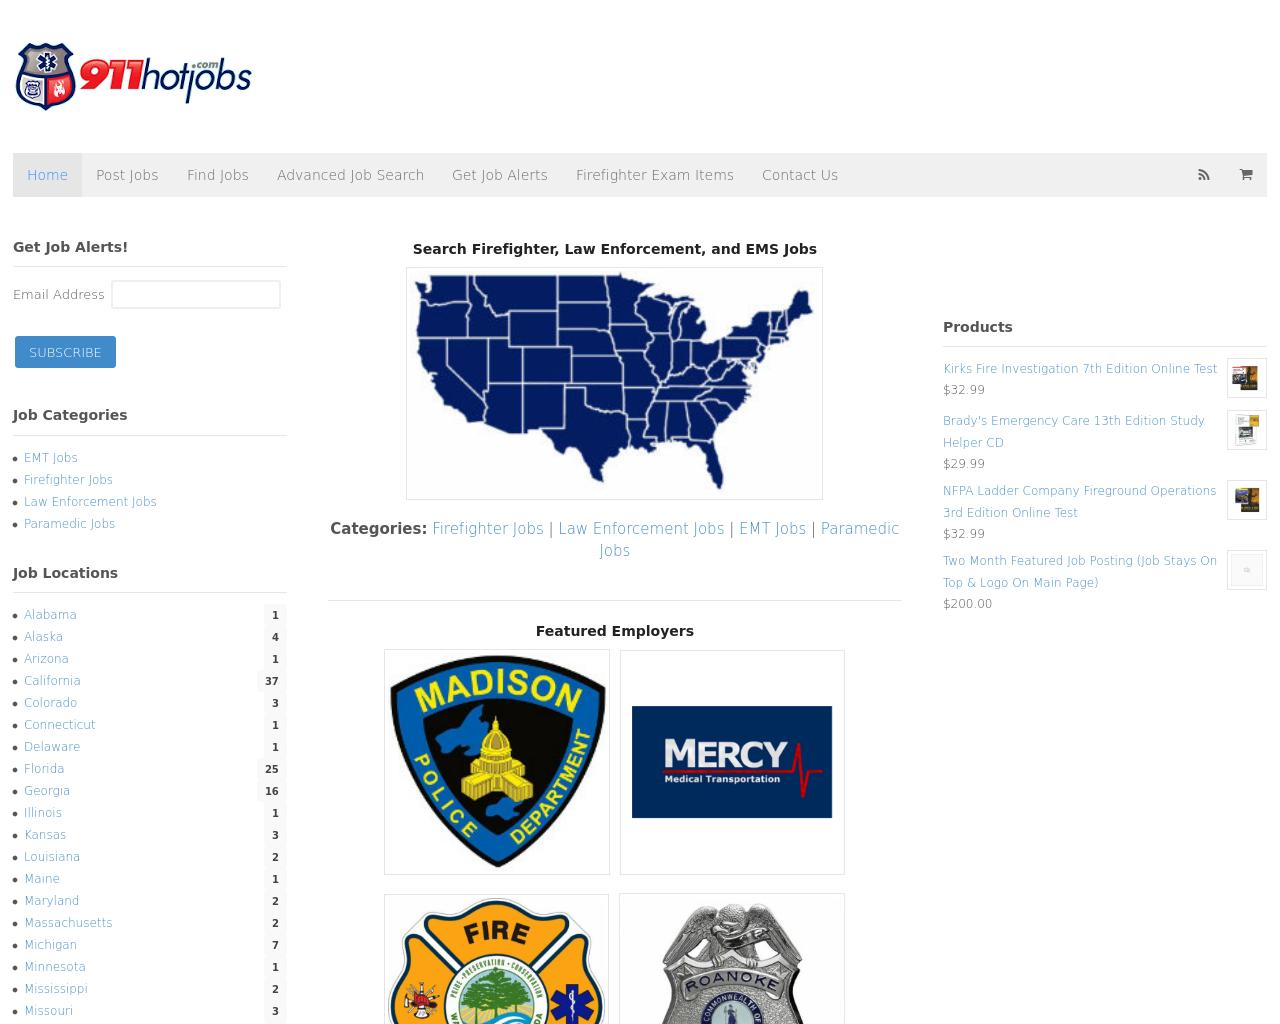 911hotjobs-Advertising-Reviews-Pricing